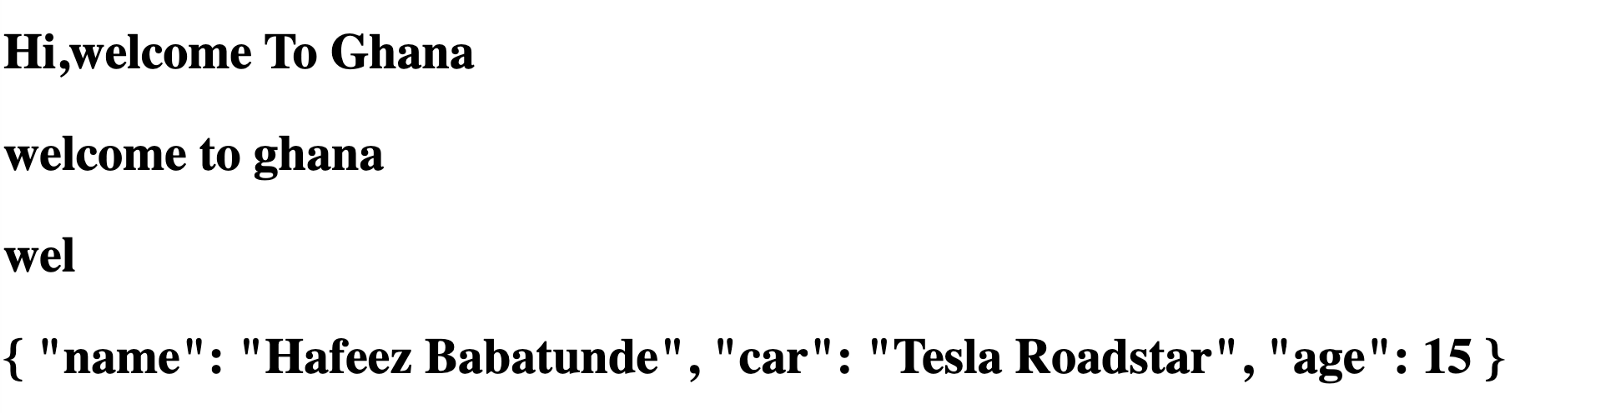 "'Hi,welcome To Ghana'. 'welcome to ghana'. 'wel'. '{ ""name"": ""Hafeez Babatunde"", ""car"": ""Tesla Roadstar"", ""age"": ""15""}.'"